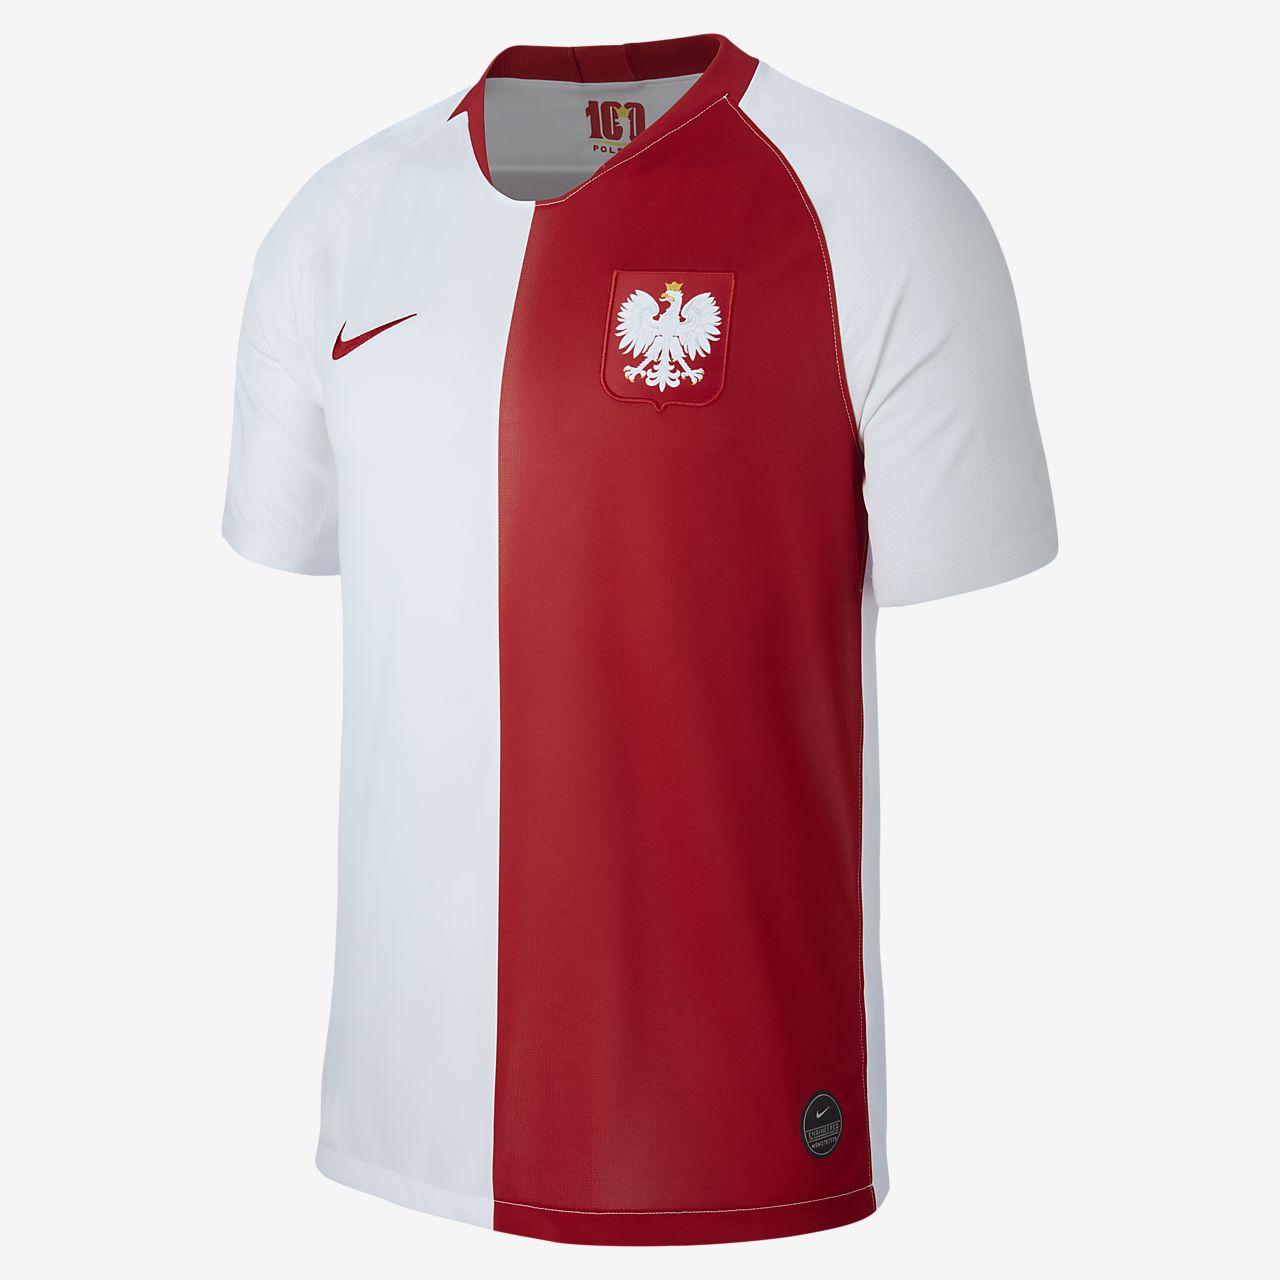 Camiseta para hombre Poland Stadium Centennial